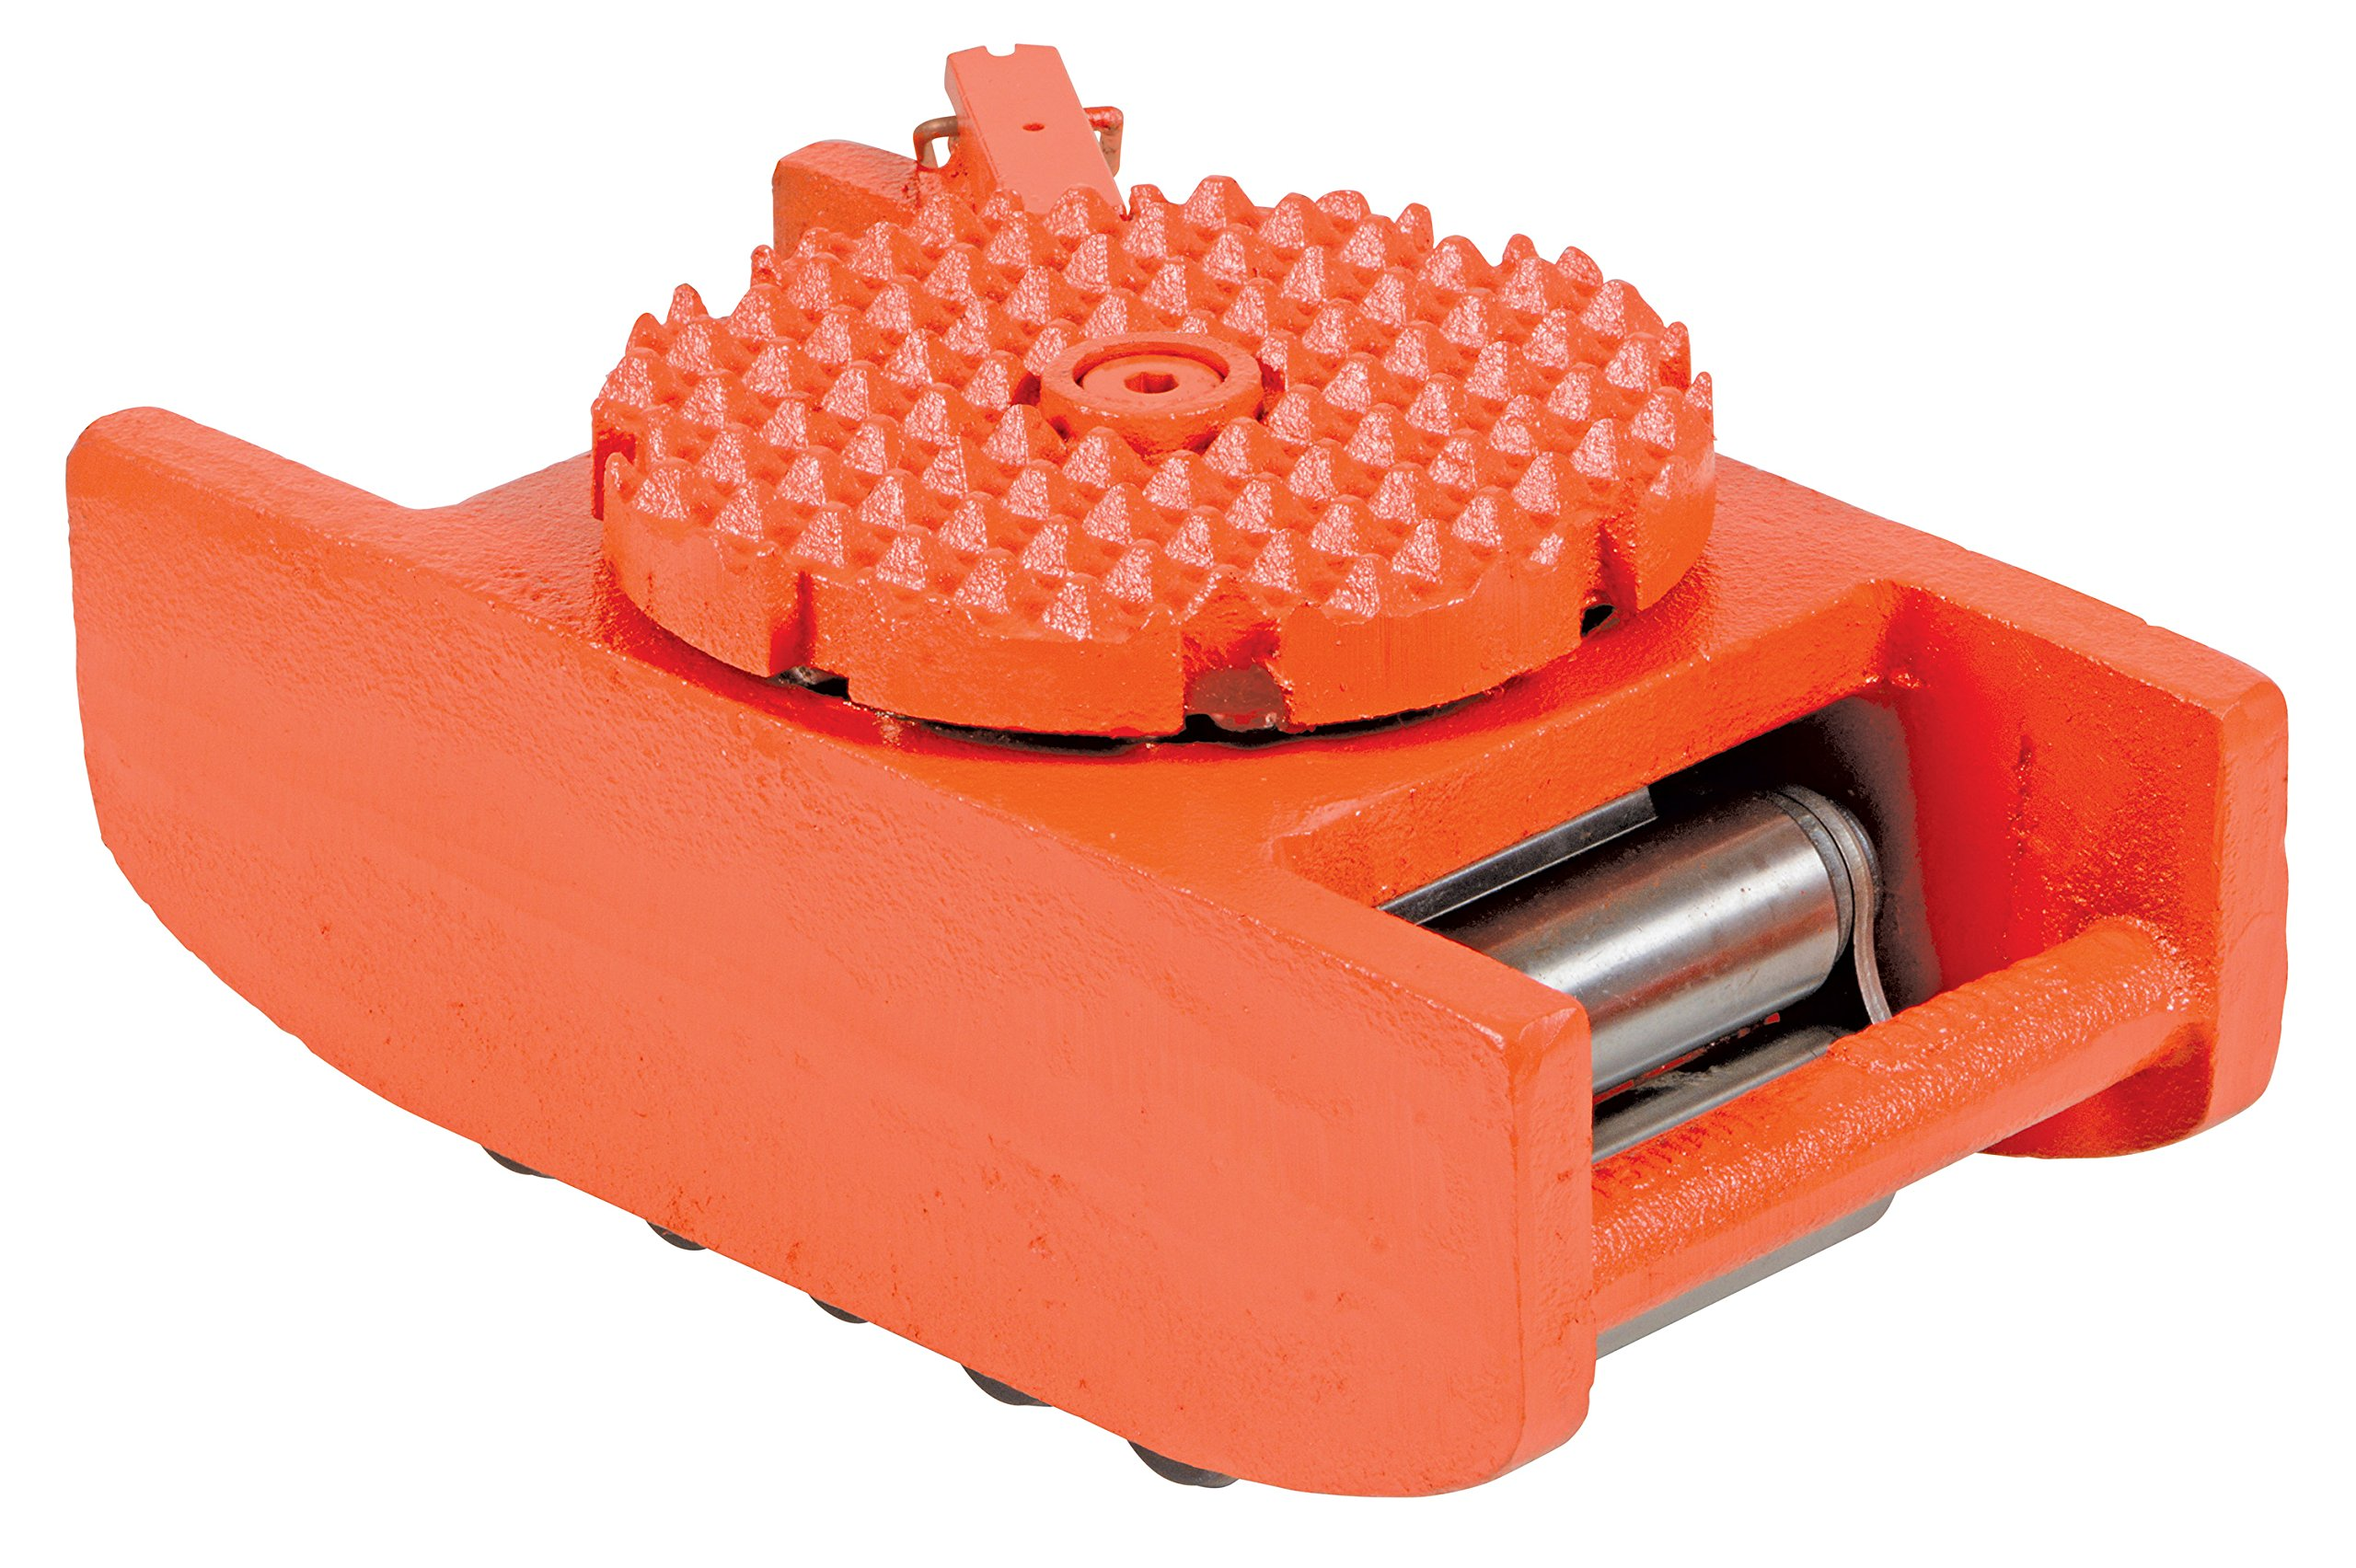 Vestil VHMS-15 Swivel Top Machine Roller, Iron Body with Steel Bearings, 15000 lb. Capacity, 4-7/8'' x 5-3/4'' x 10-1/2'' by Vestil